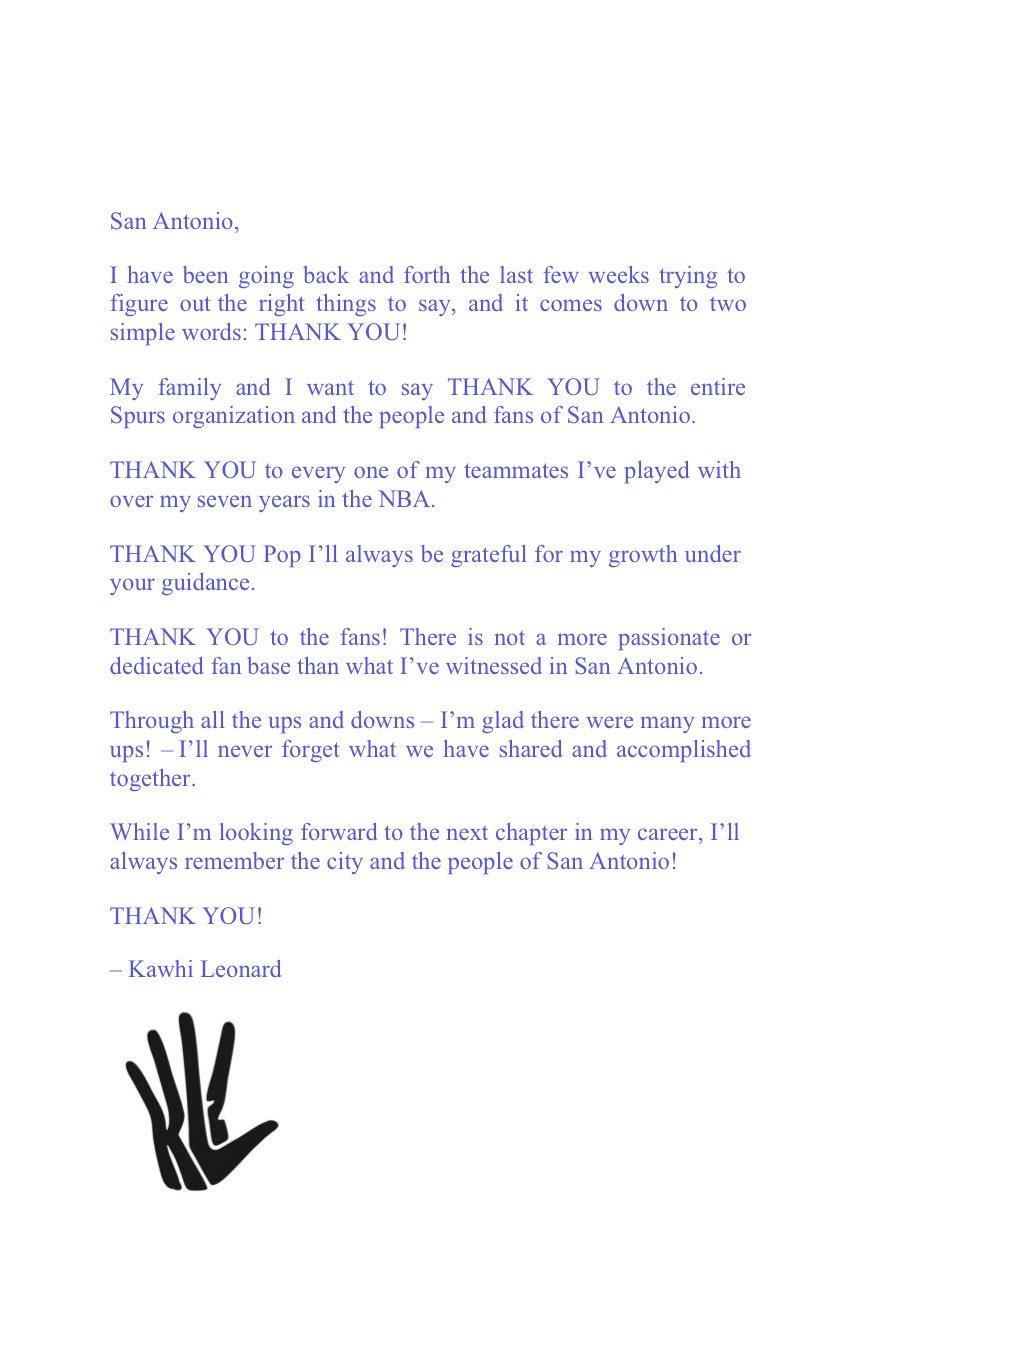 jabari young on twitter   u0026quot kawhi u2019s full thank you letter to